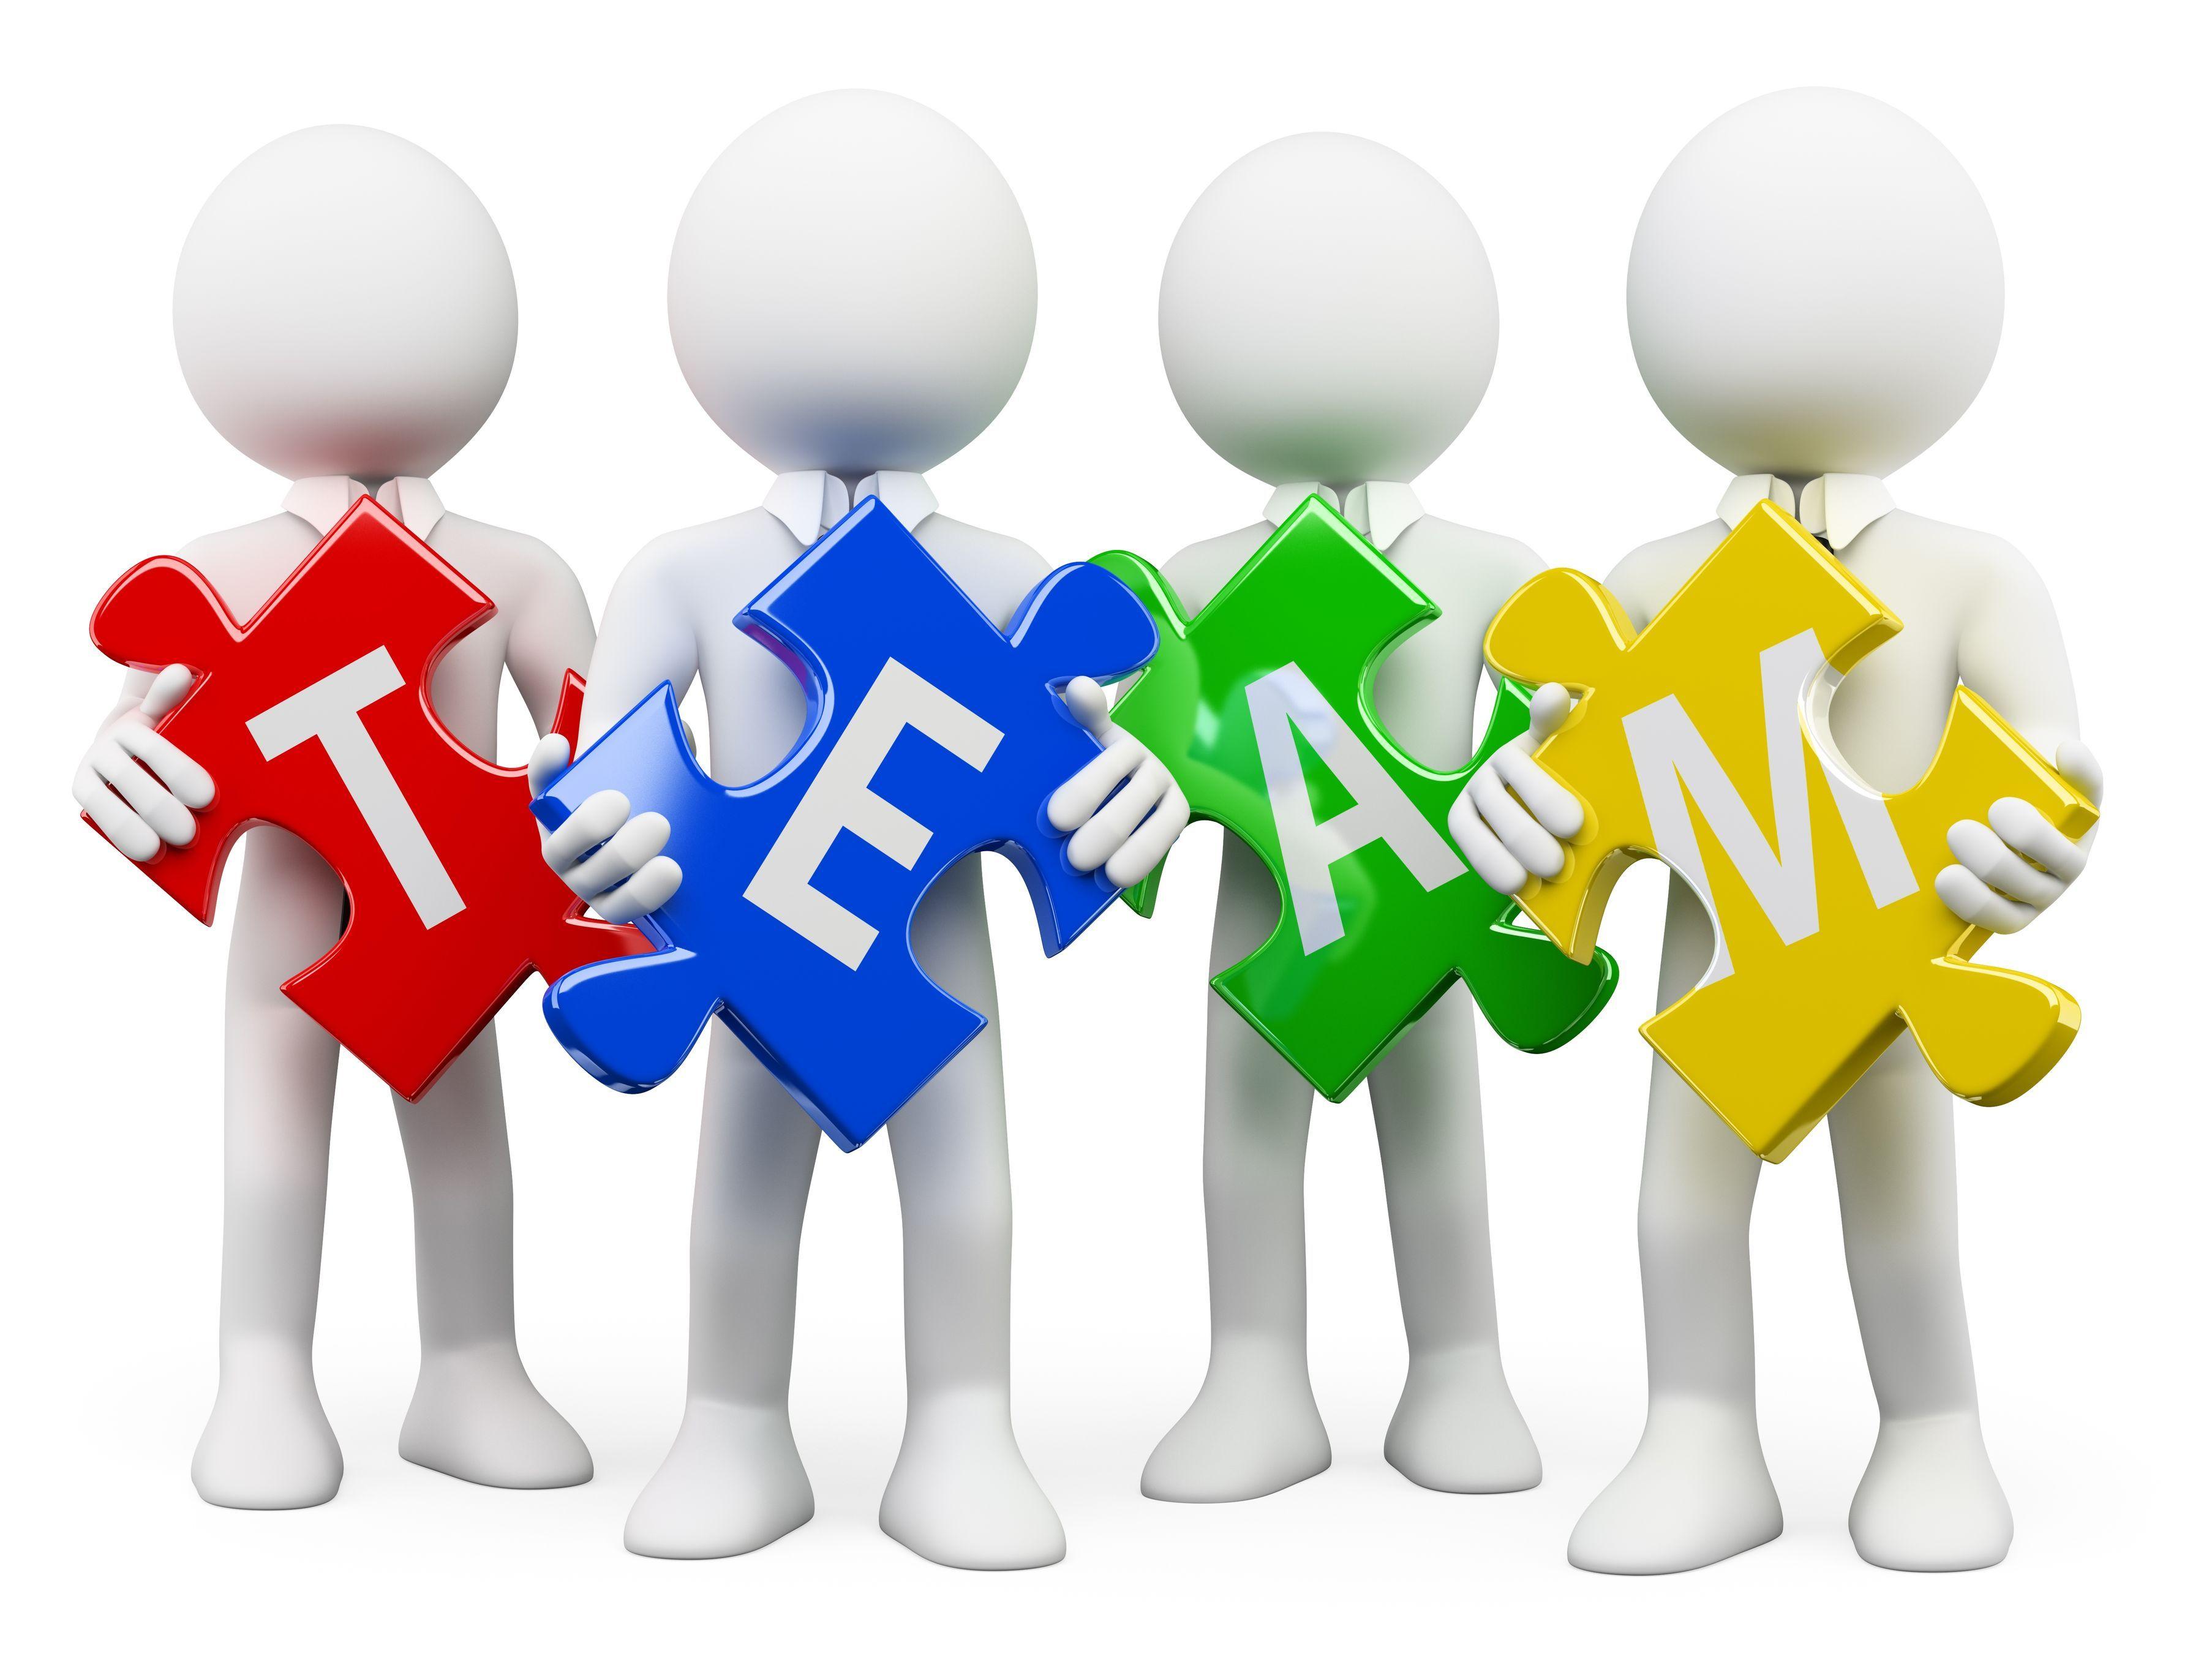 Poppetjes Met Team 3612 215 2709 Bonhomme Blanc 3d Pinterest Lernen